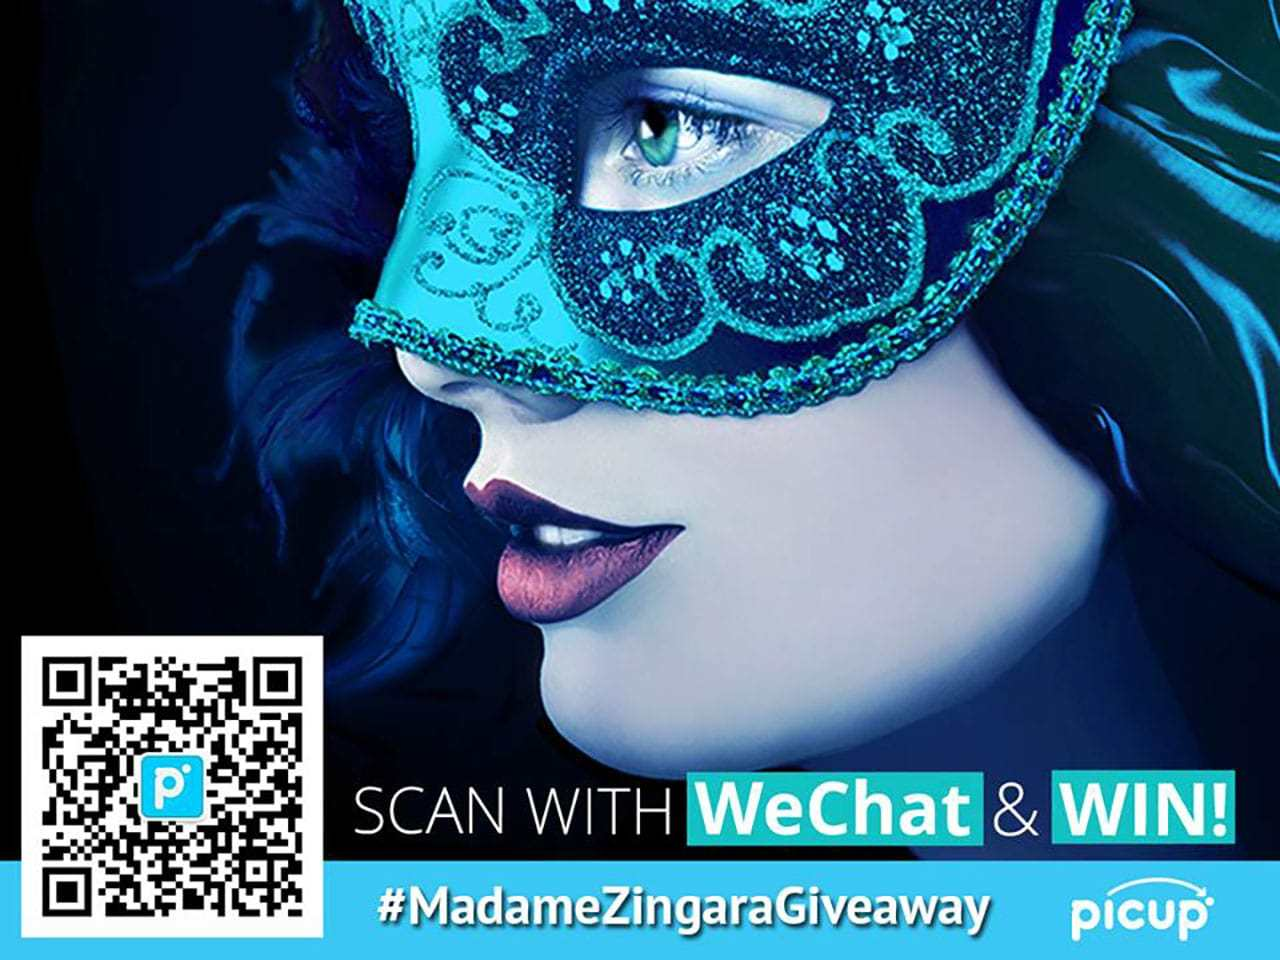 WeChat OA - Official Account - Building WeChat Followers - WeChat Campaign